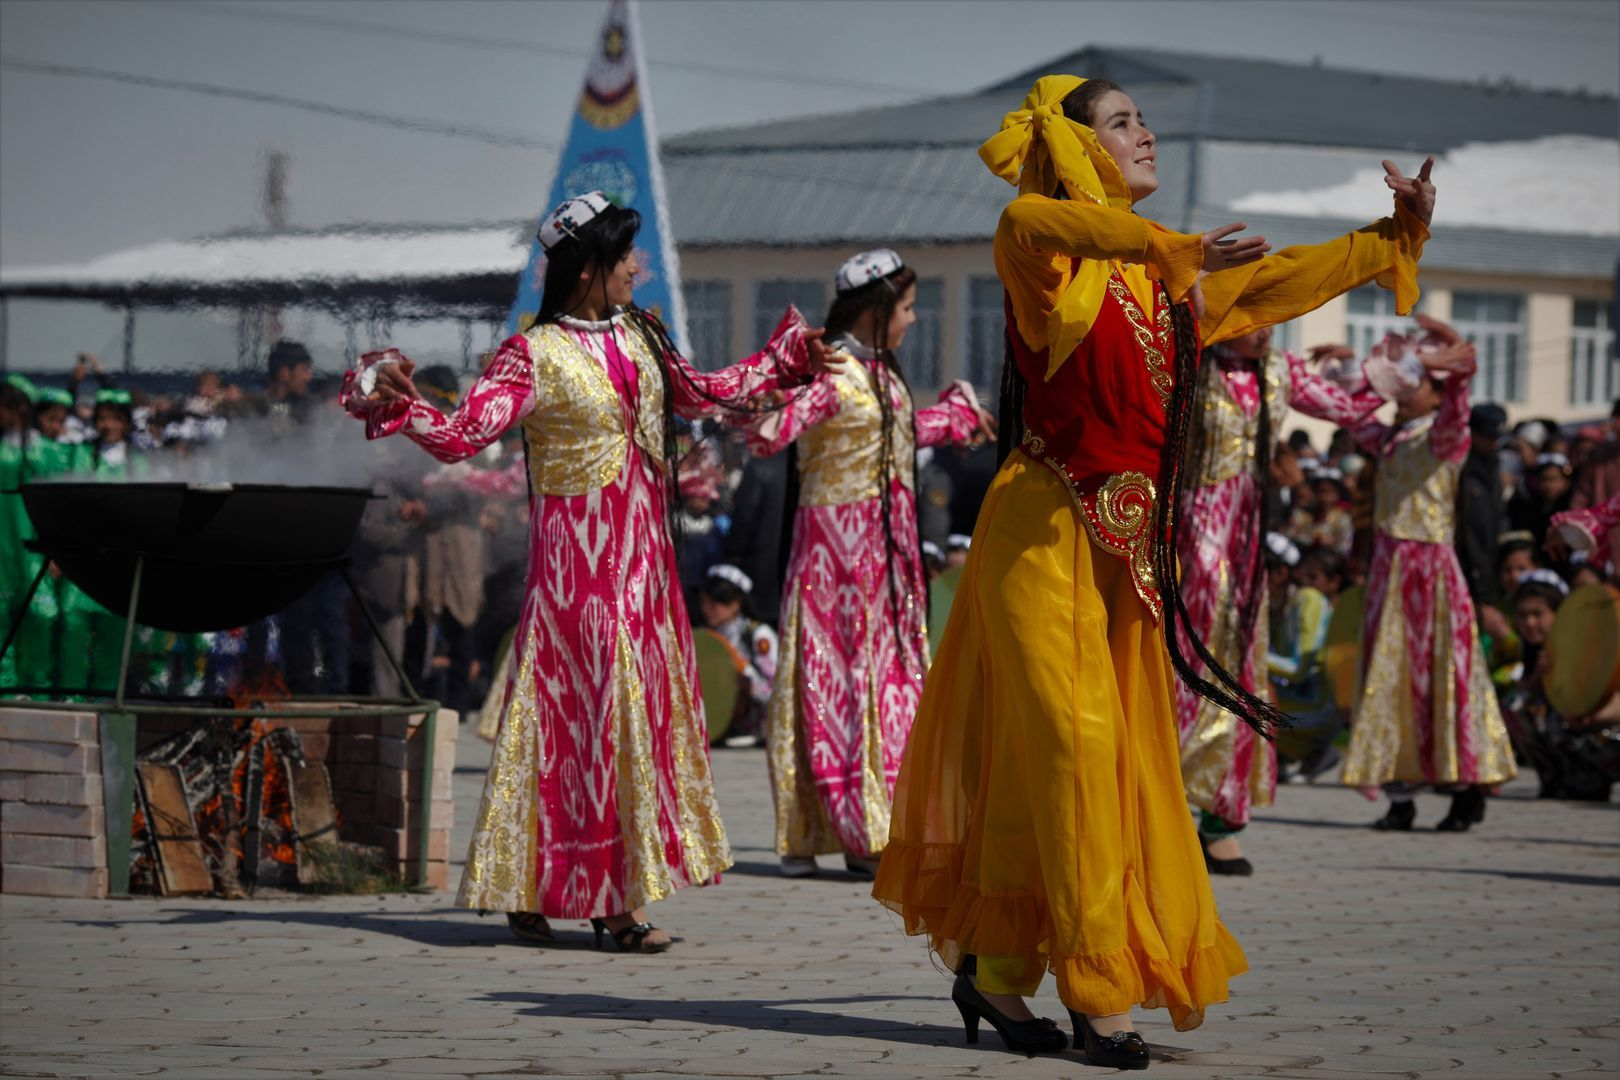 Central Asia Festival, Tajikistan